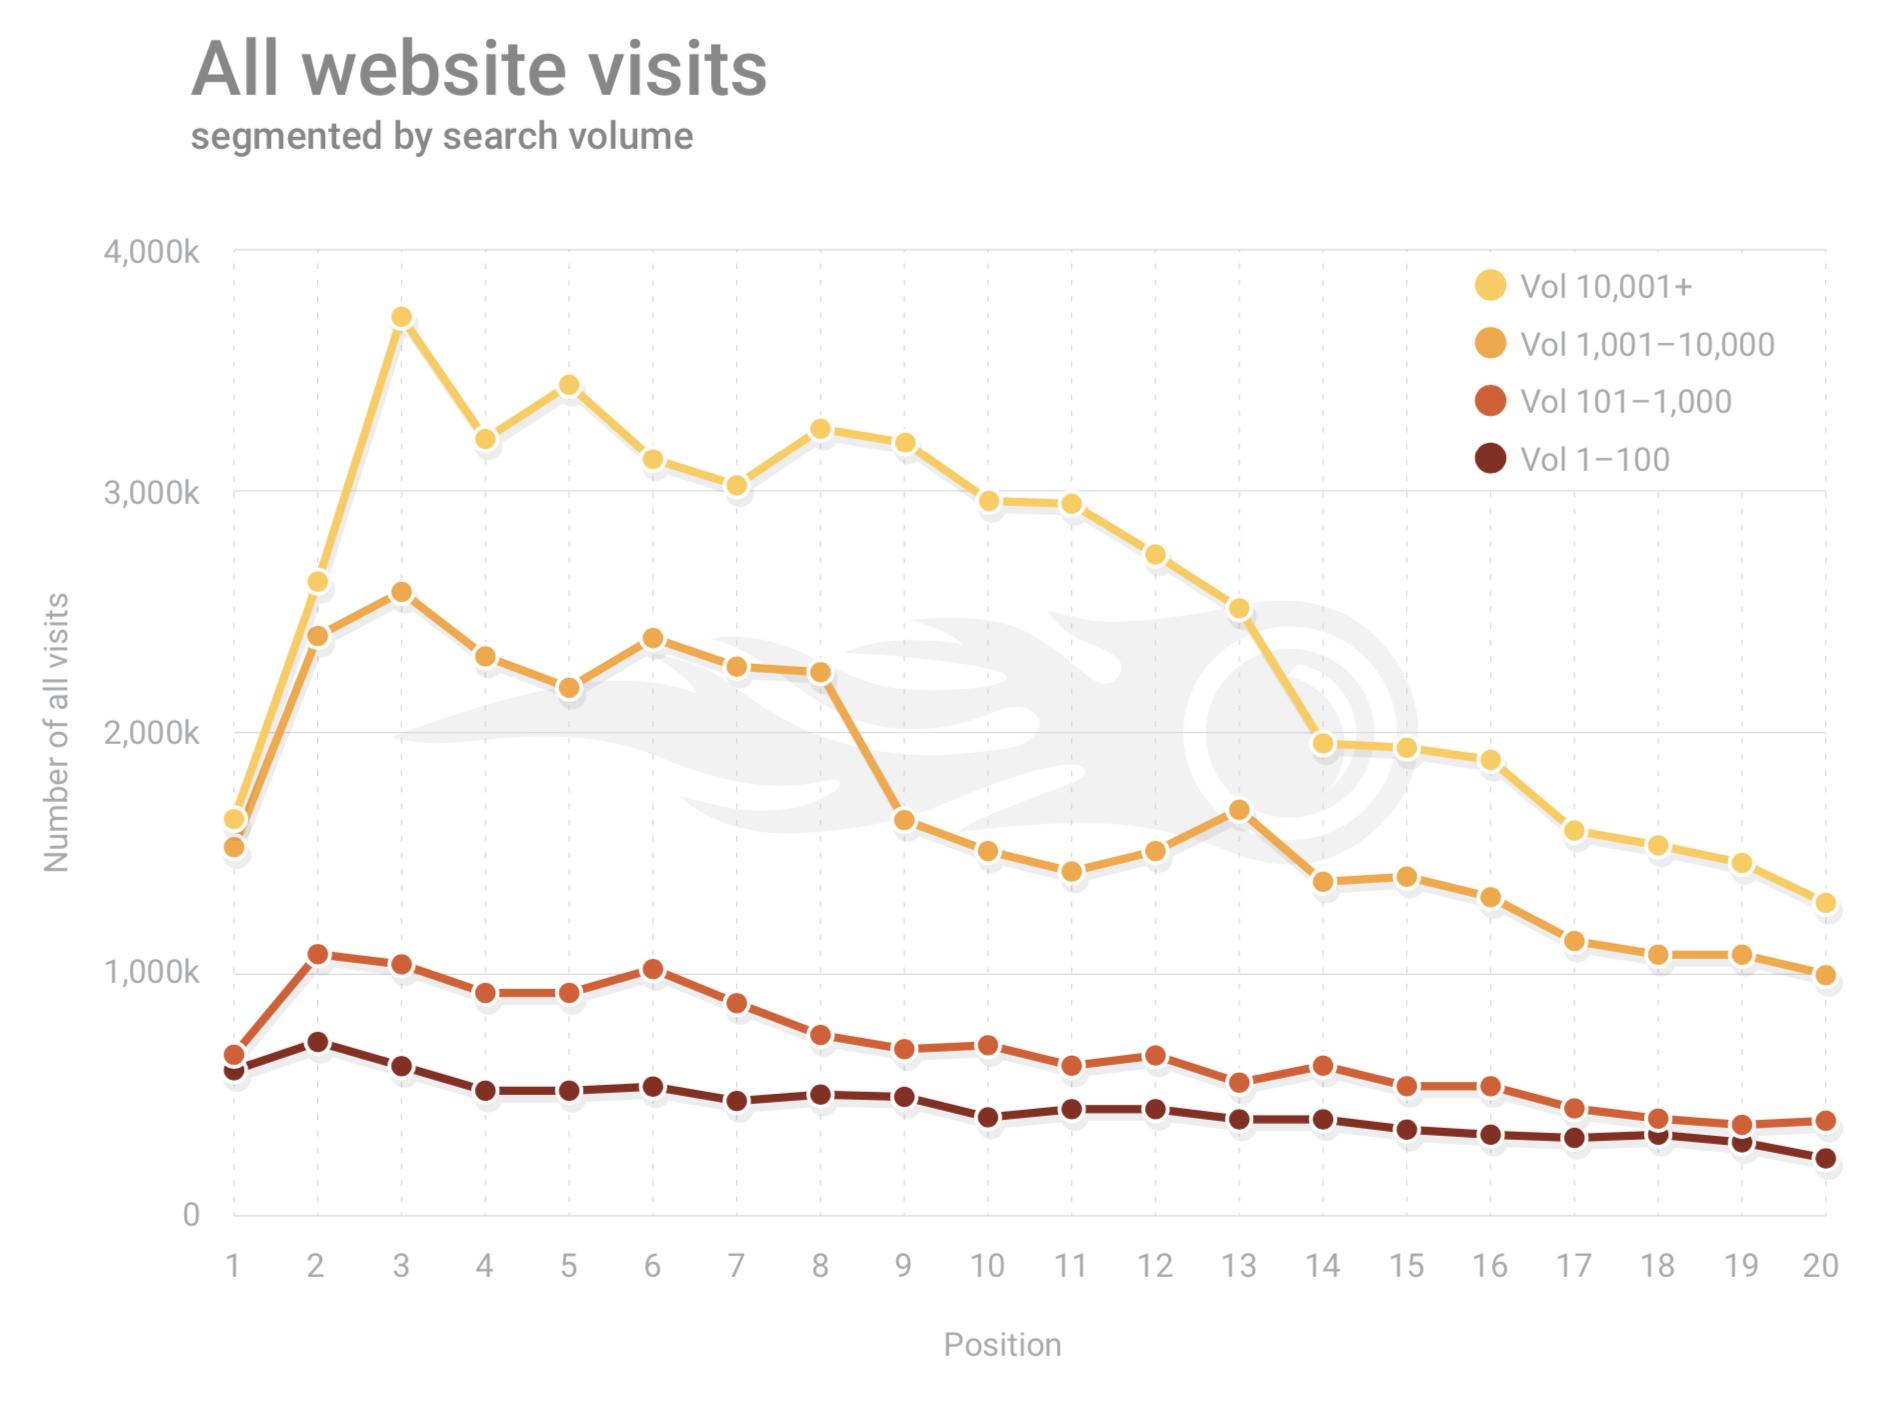 SEMRush Google all website visits 2019